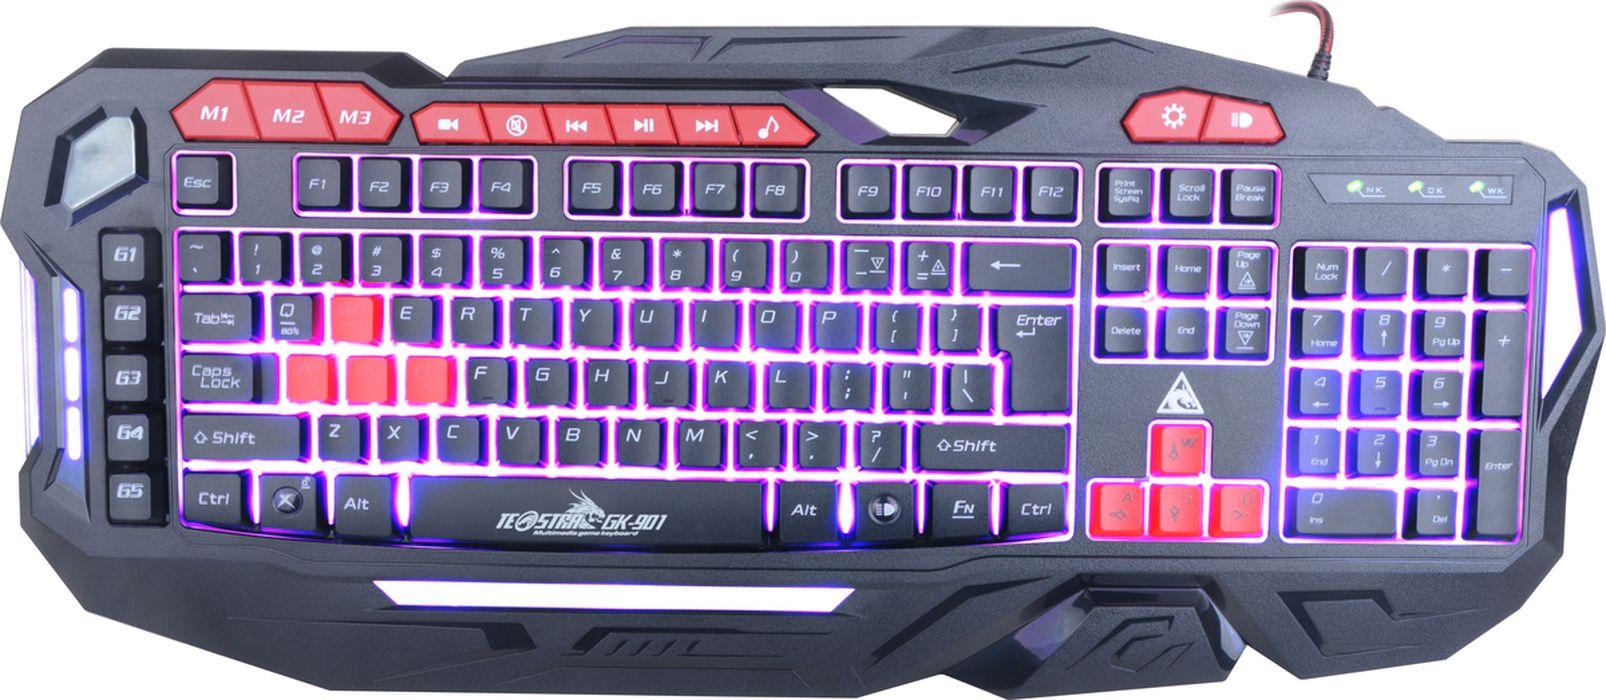 лучшая цена Xtrike Me GK-901, Black игровая клавиатура